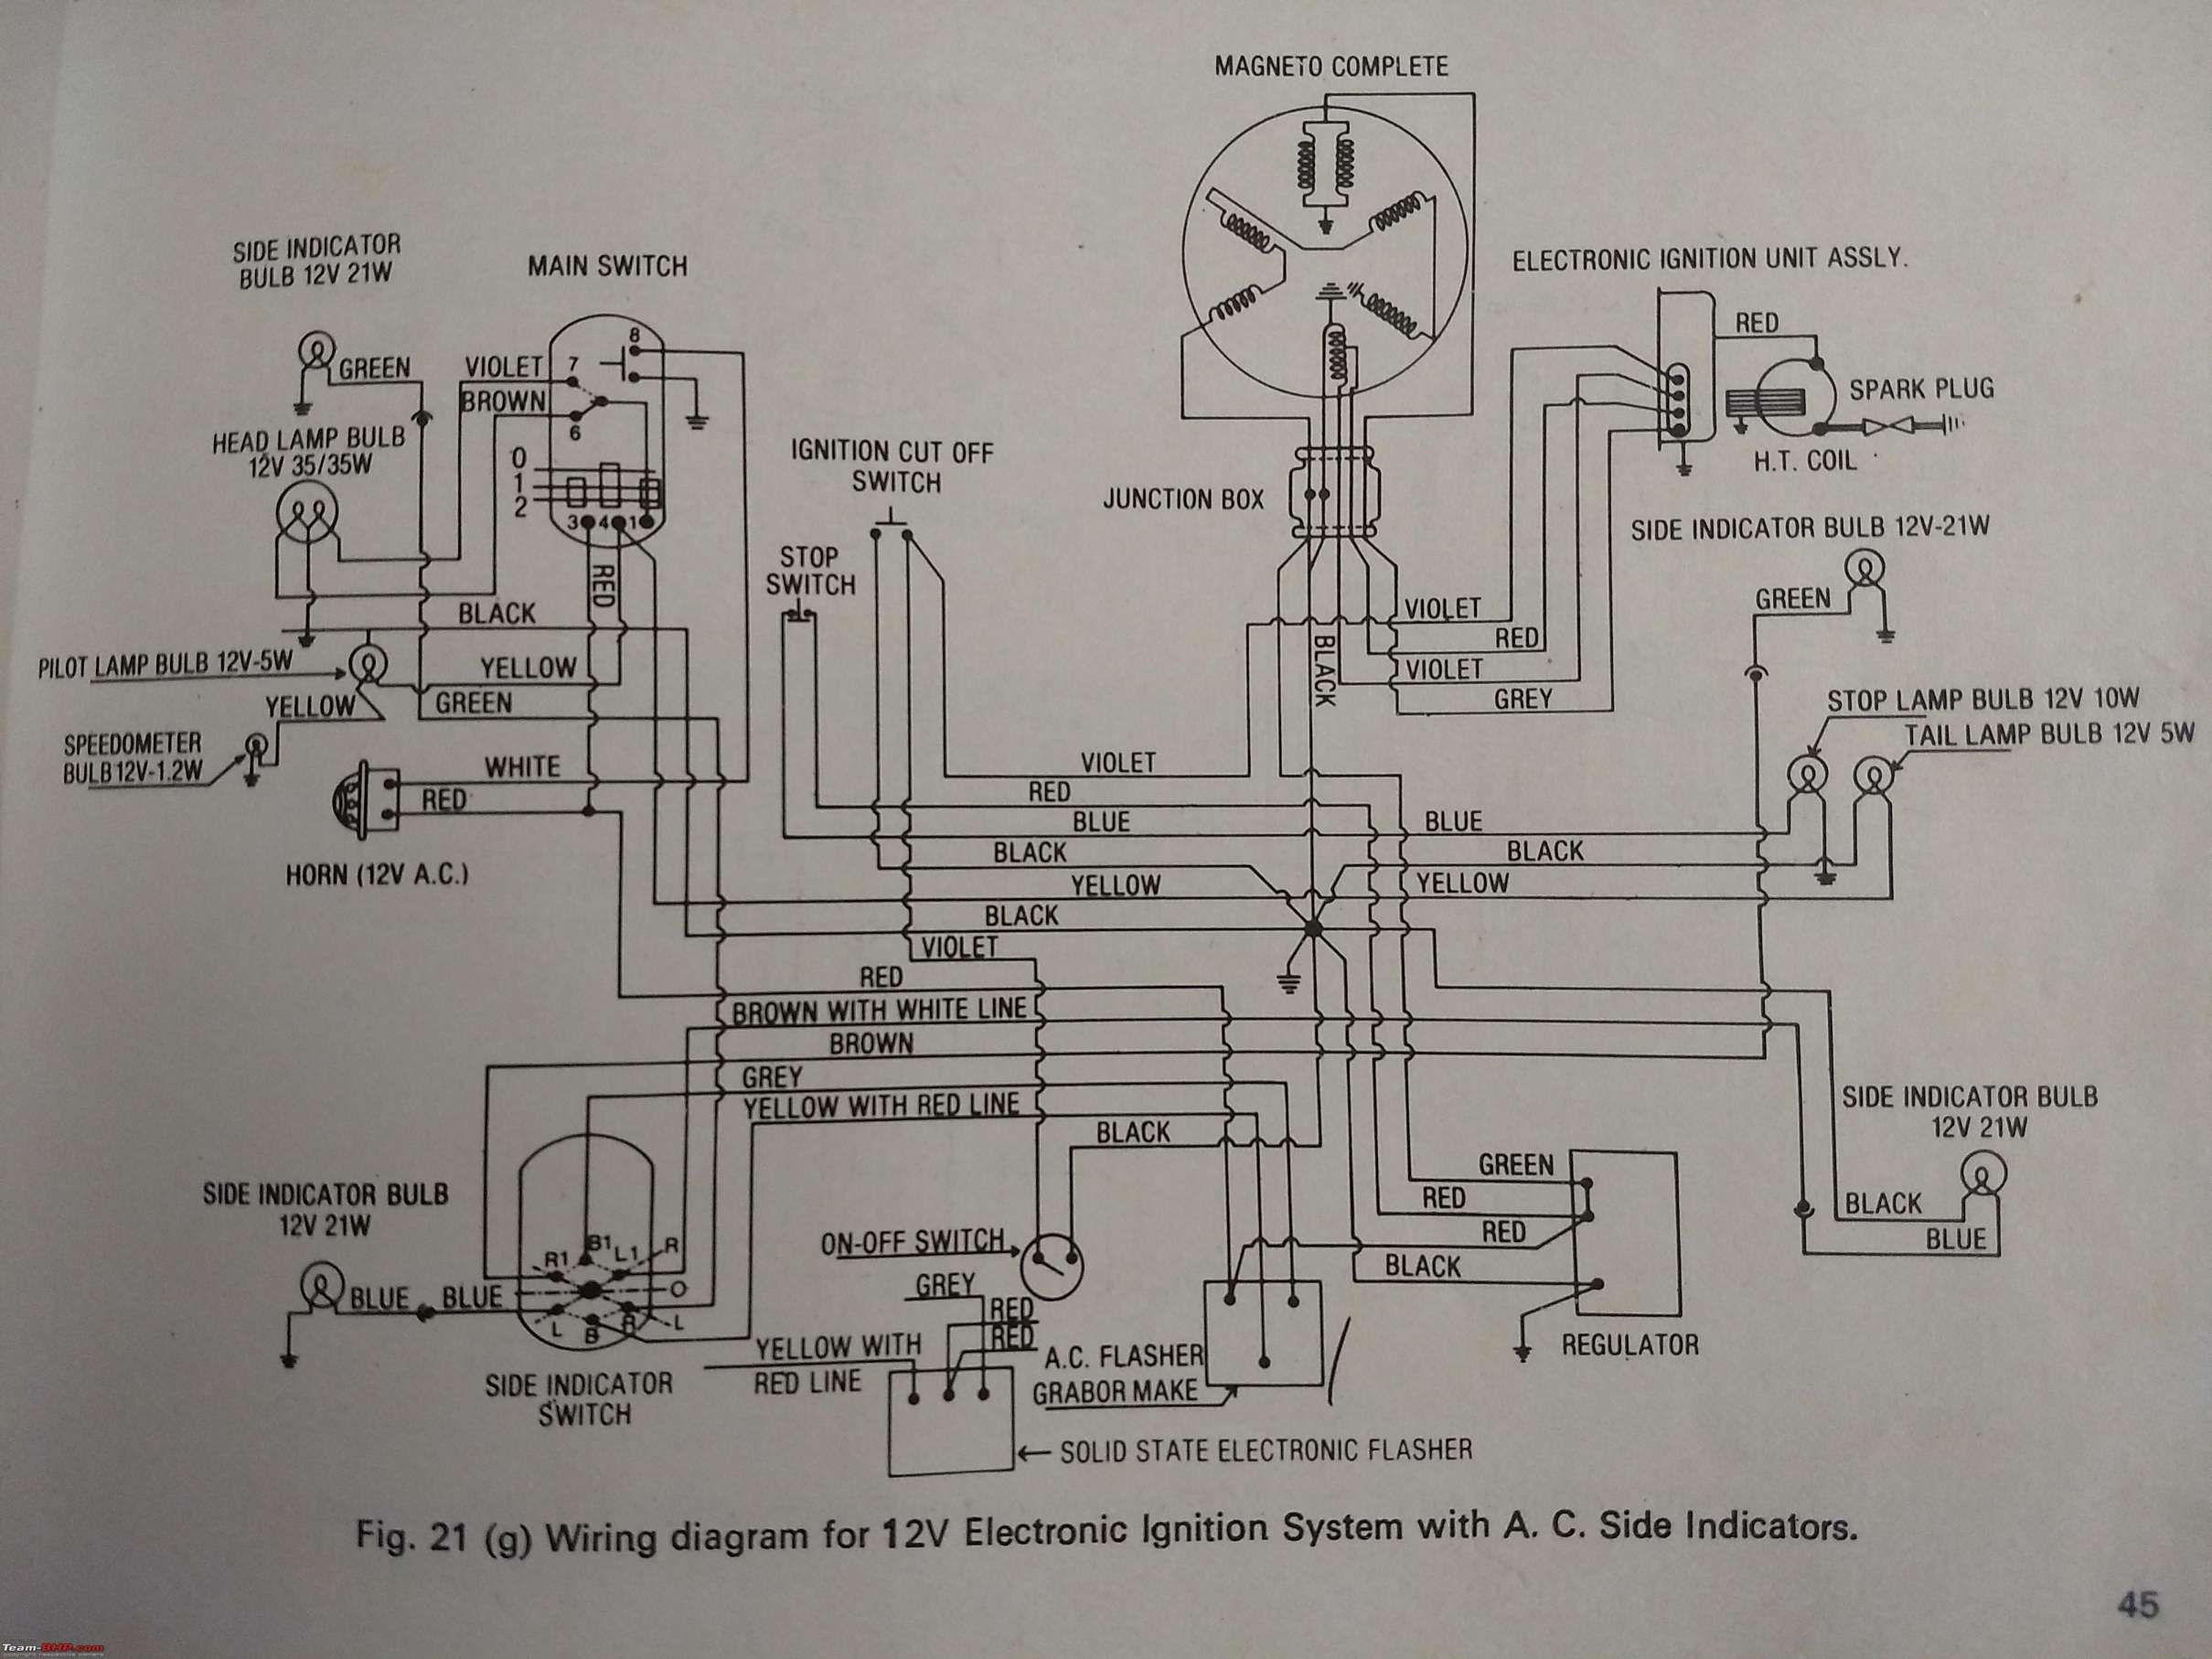 12 Bajaj Pulsar 150 Electrical Wiring Diagram Wiring Diagram Wiringg Net In 2020 Electrical Wiring Diagram Diagram Design Diagram